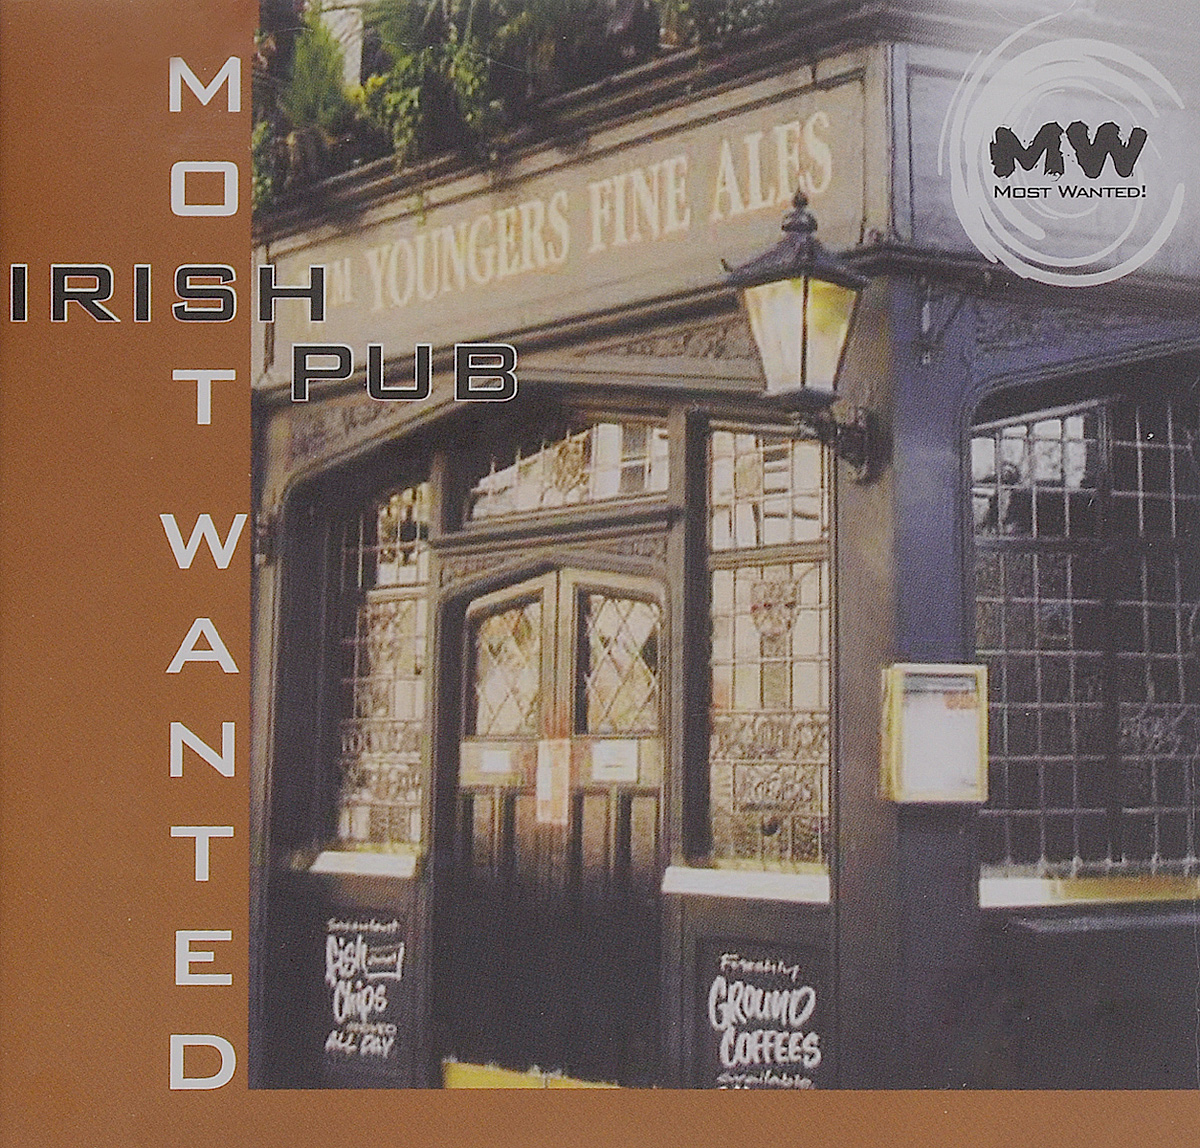 Most Wanted. Irish Pub the irish pub